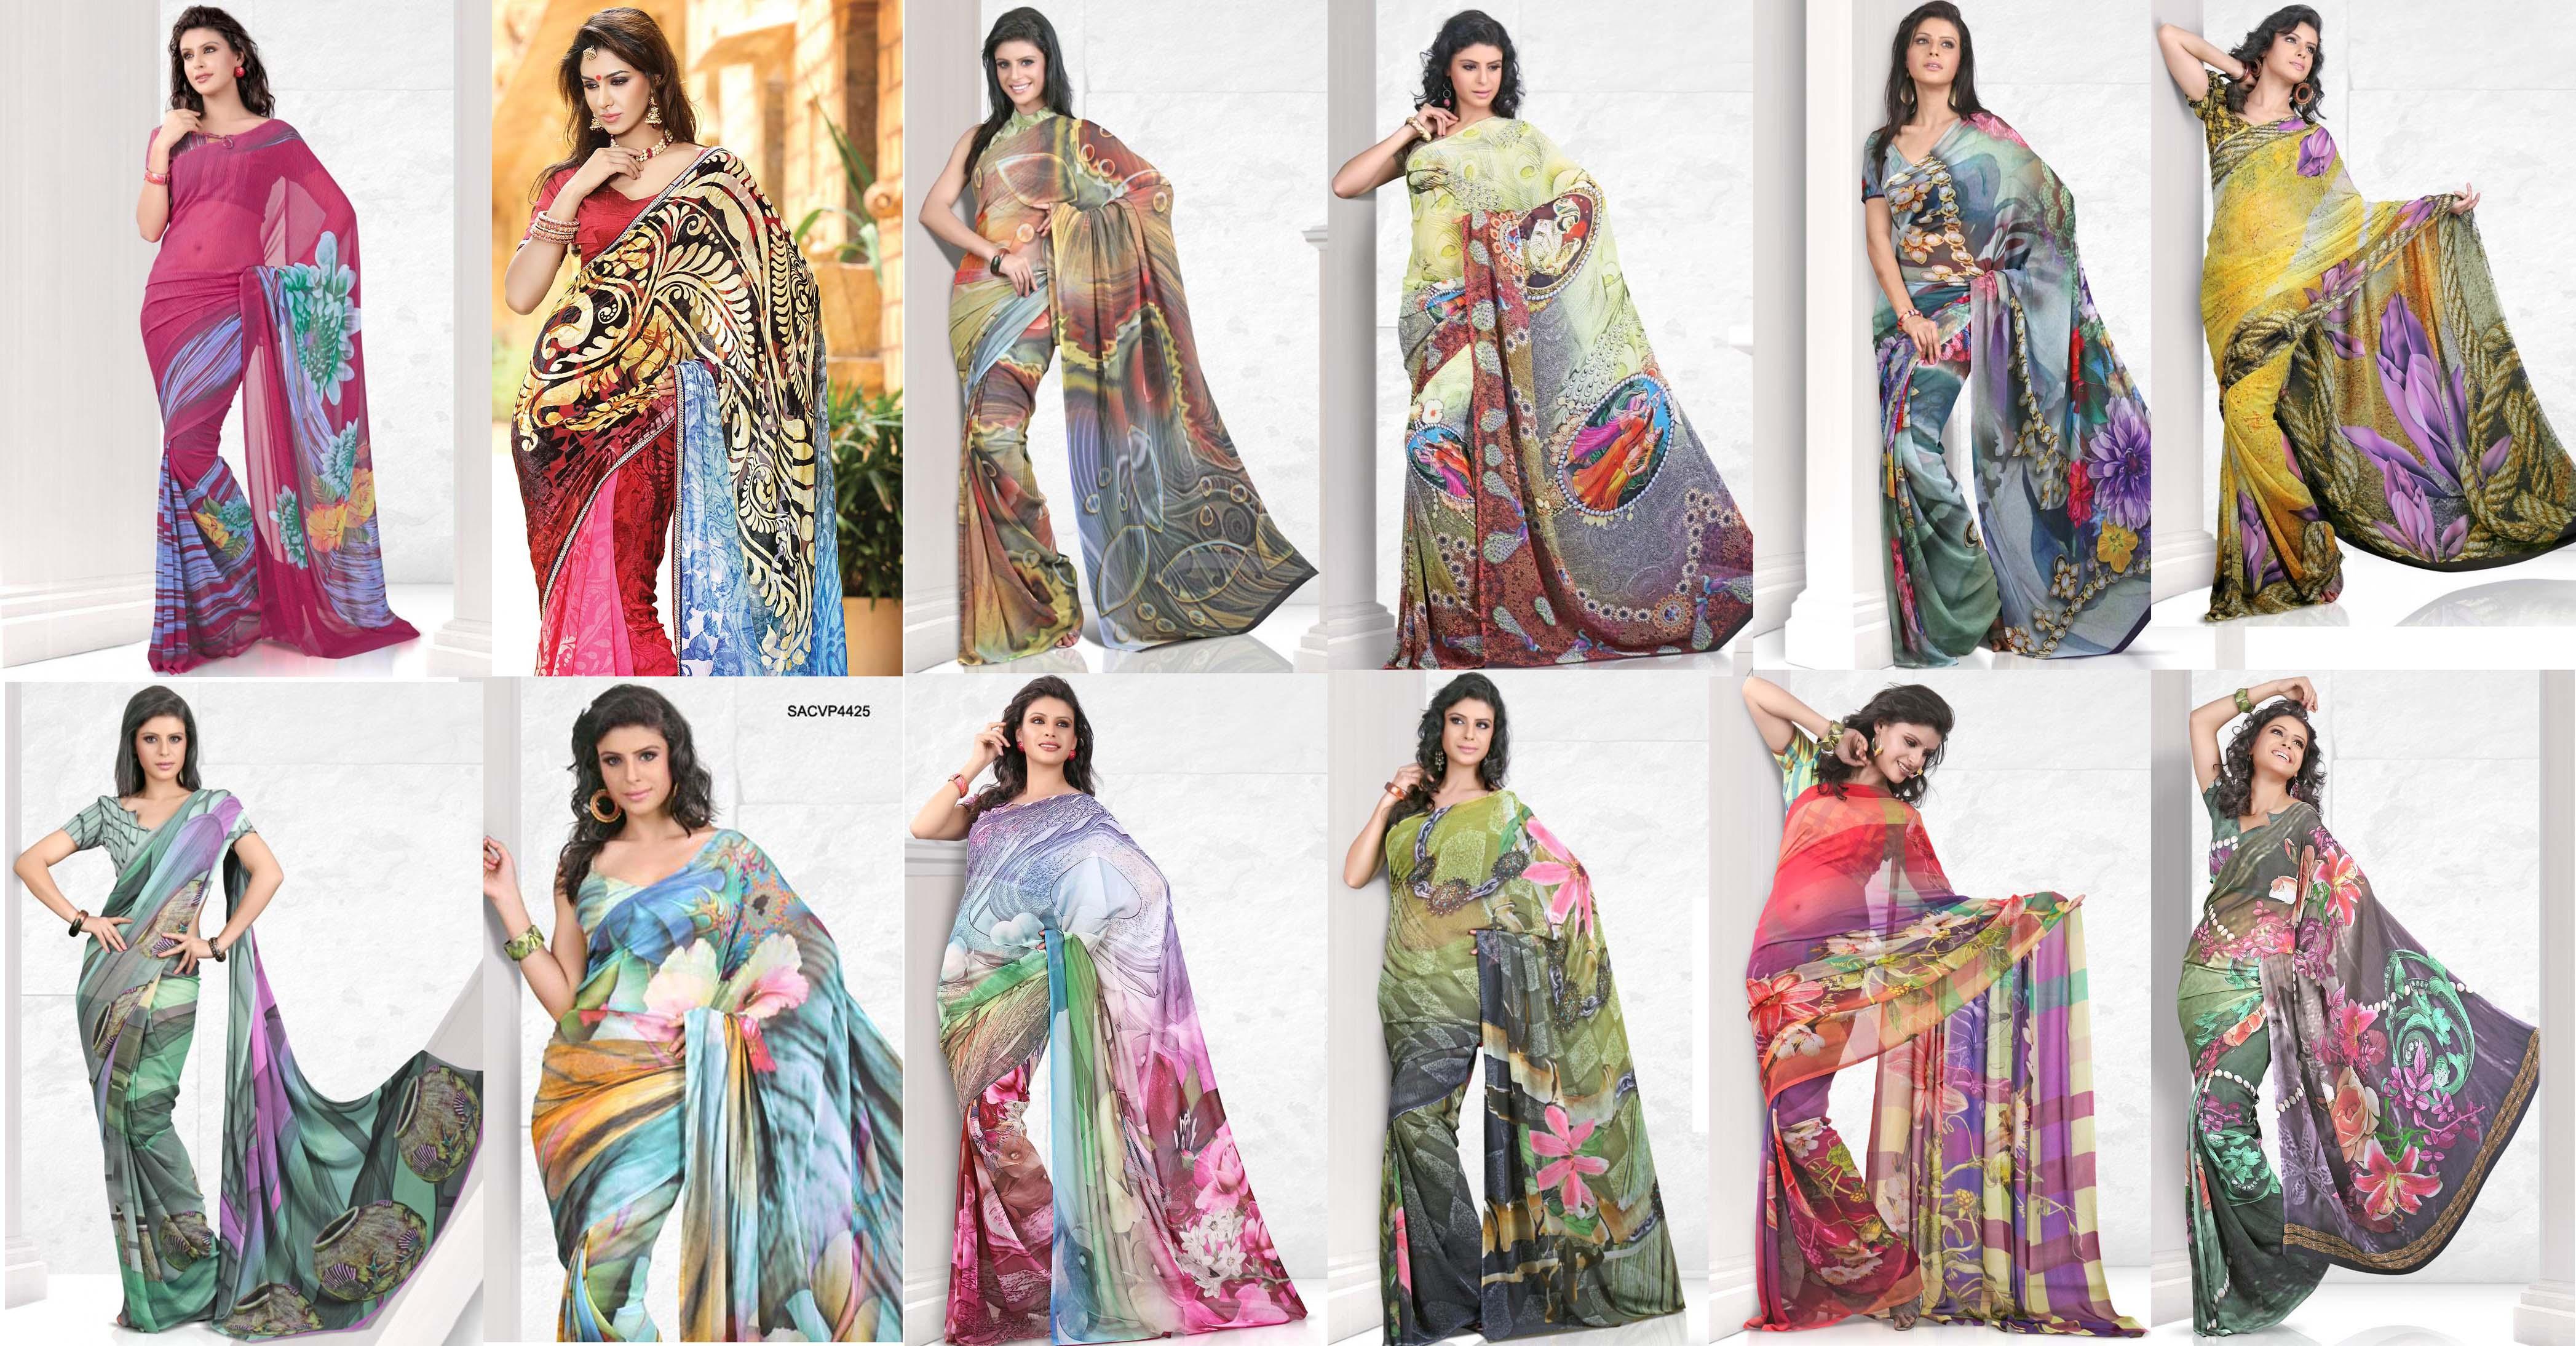 Latest Digital Printed Sarees Fashion 2015 2016 Designs